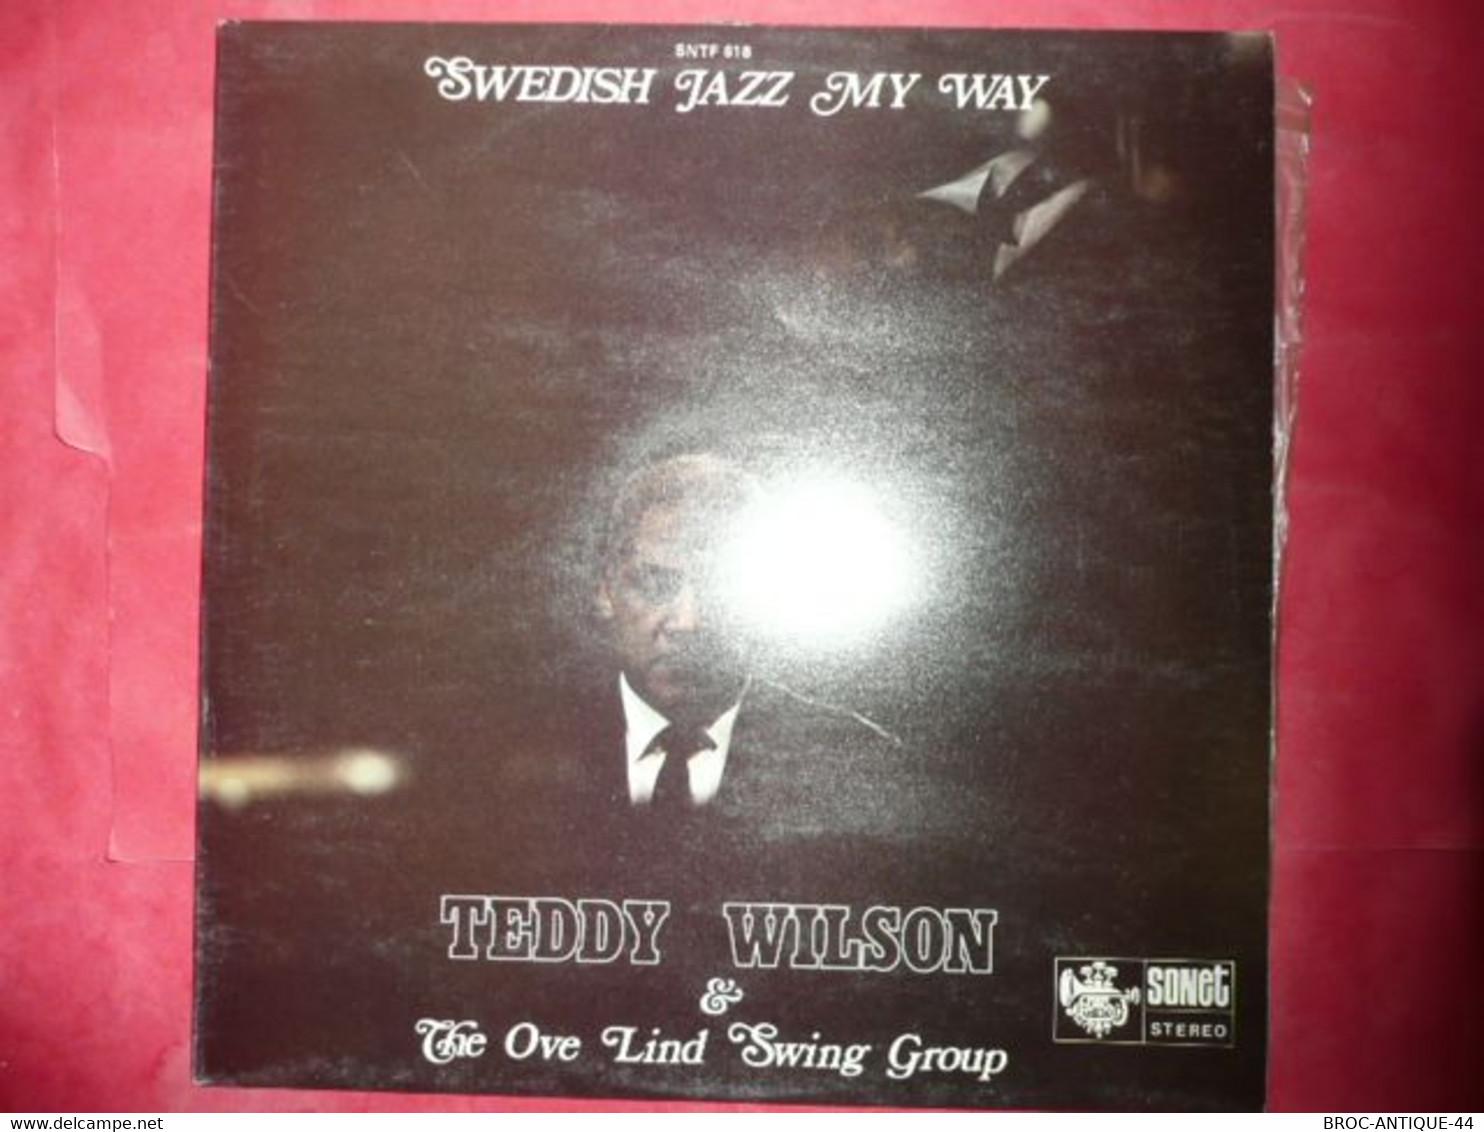 LP33 N°8106 - TEDDY WILSON & THE OVE LIND SWING GROUP - SNTF 618 - Jazz